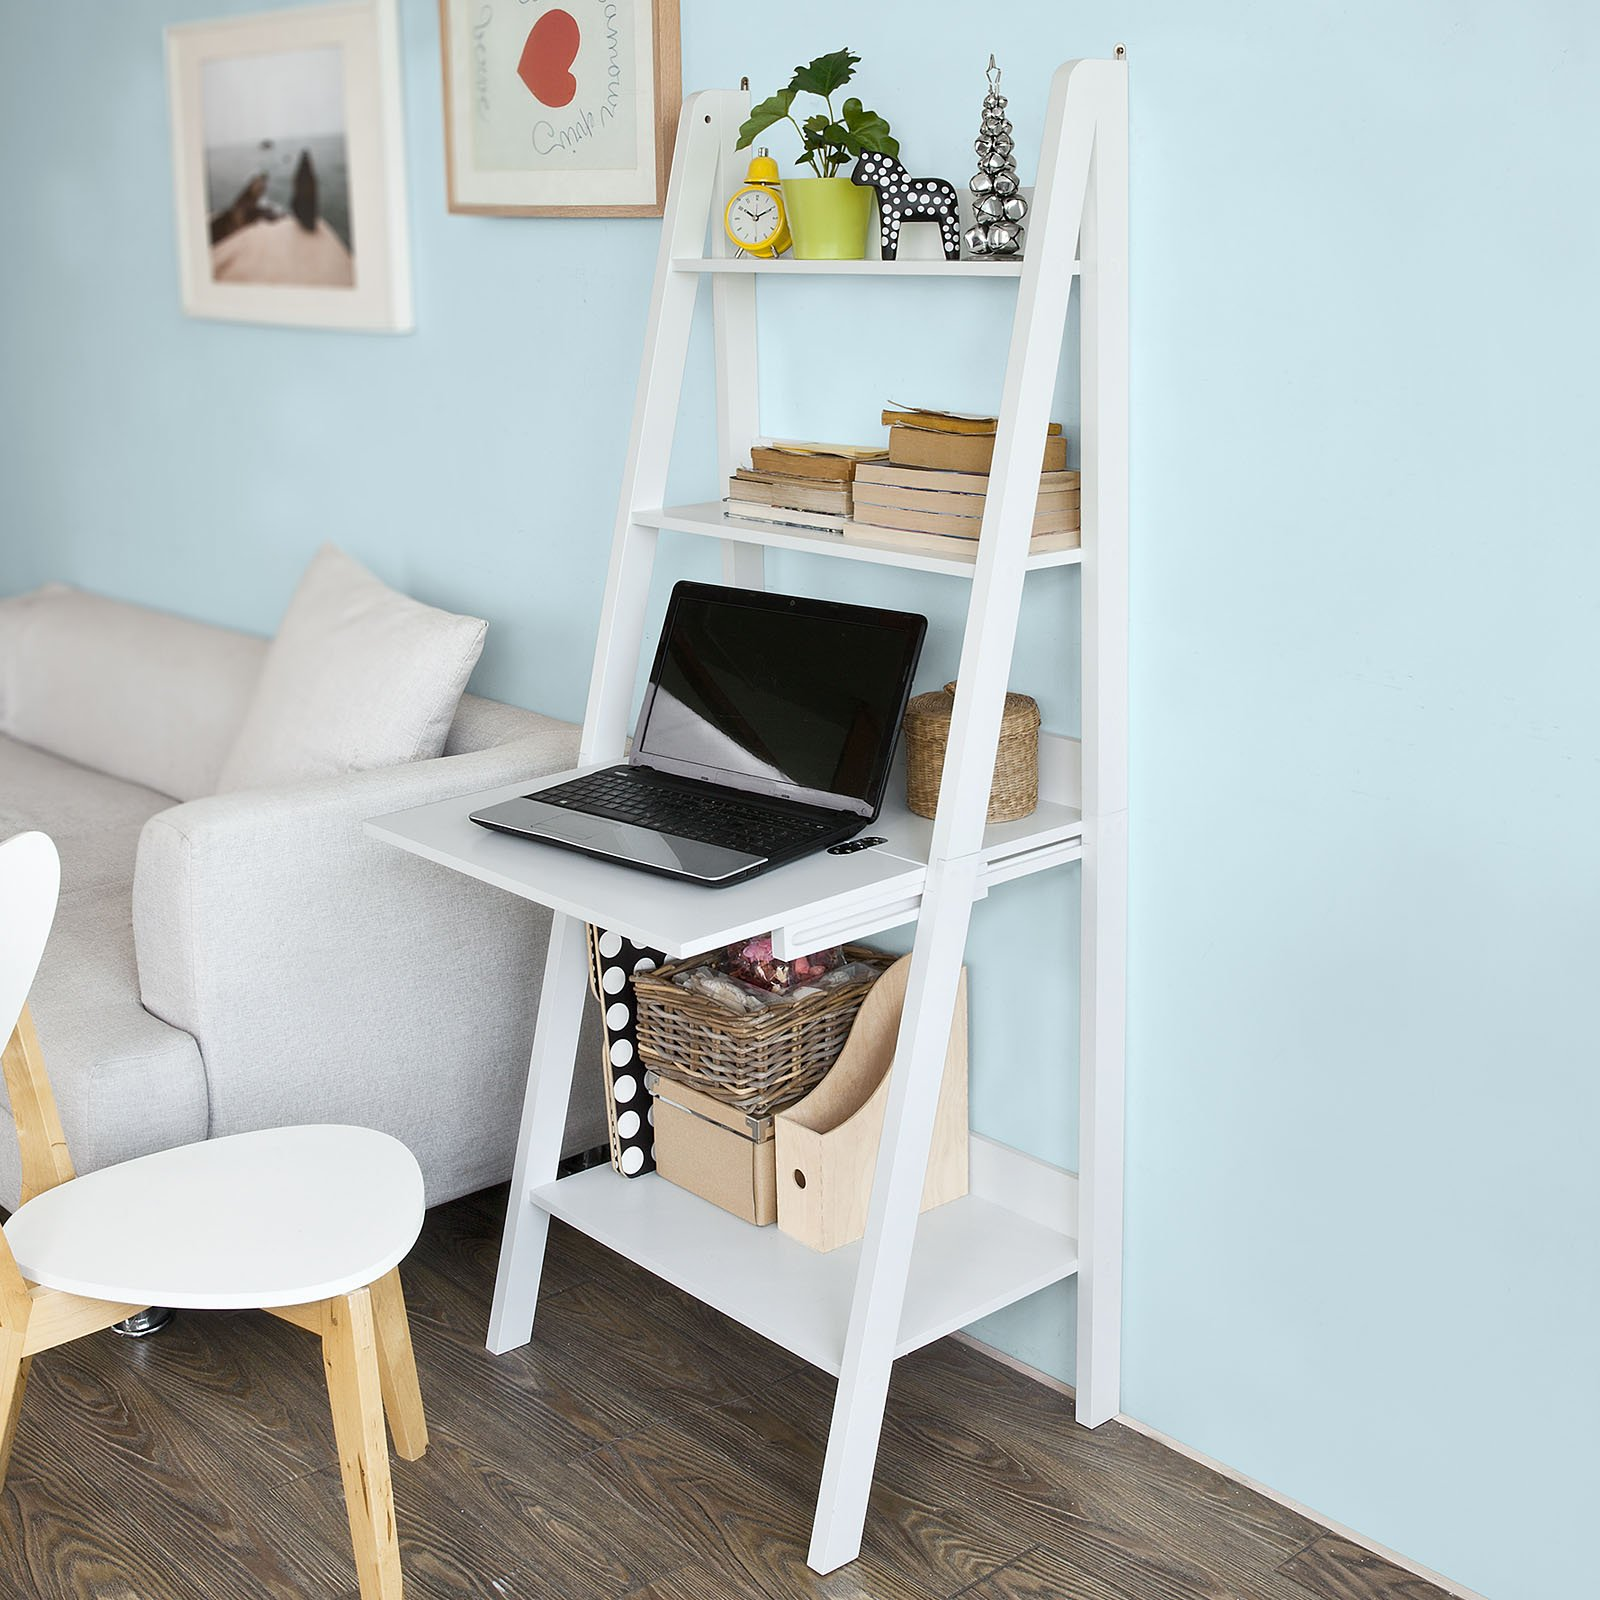 Haotian Modern Ladder Bookcase Made of Wood, Book Shelf,Stand Shelf, Wall Shelf (FRG115-W) by Haotian